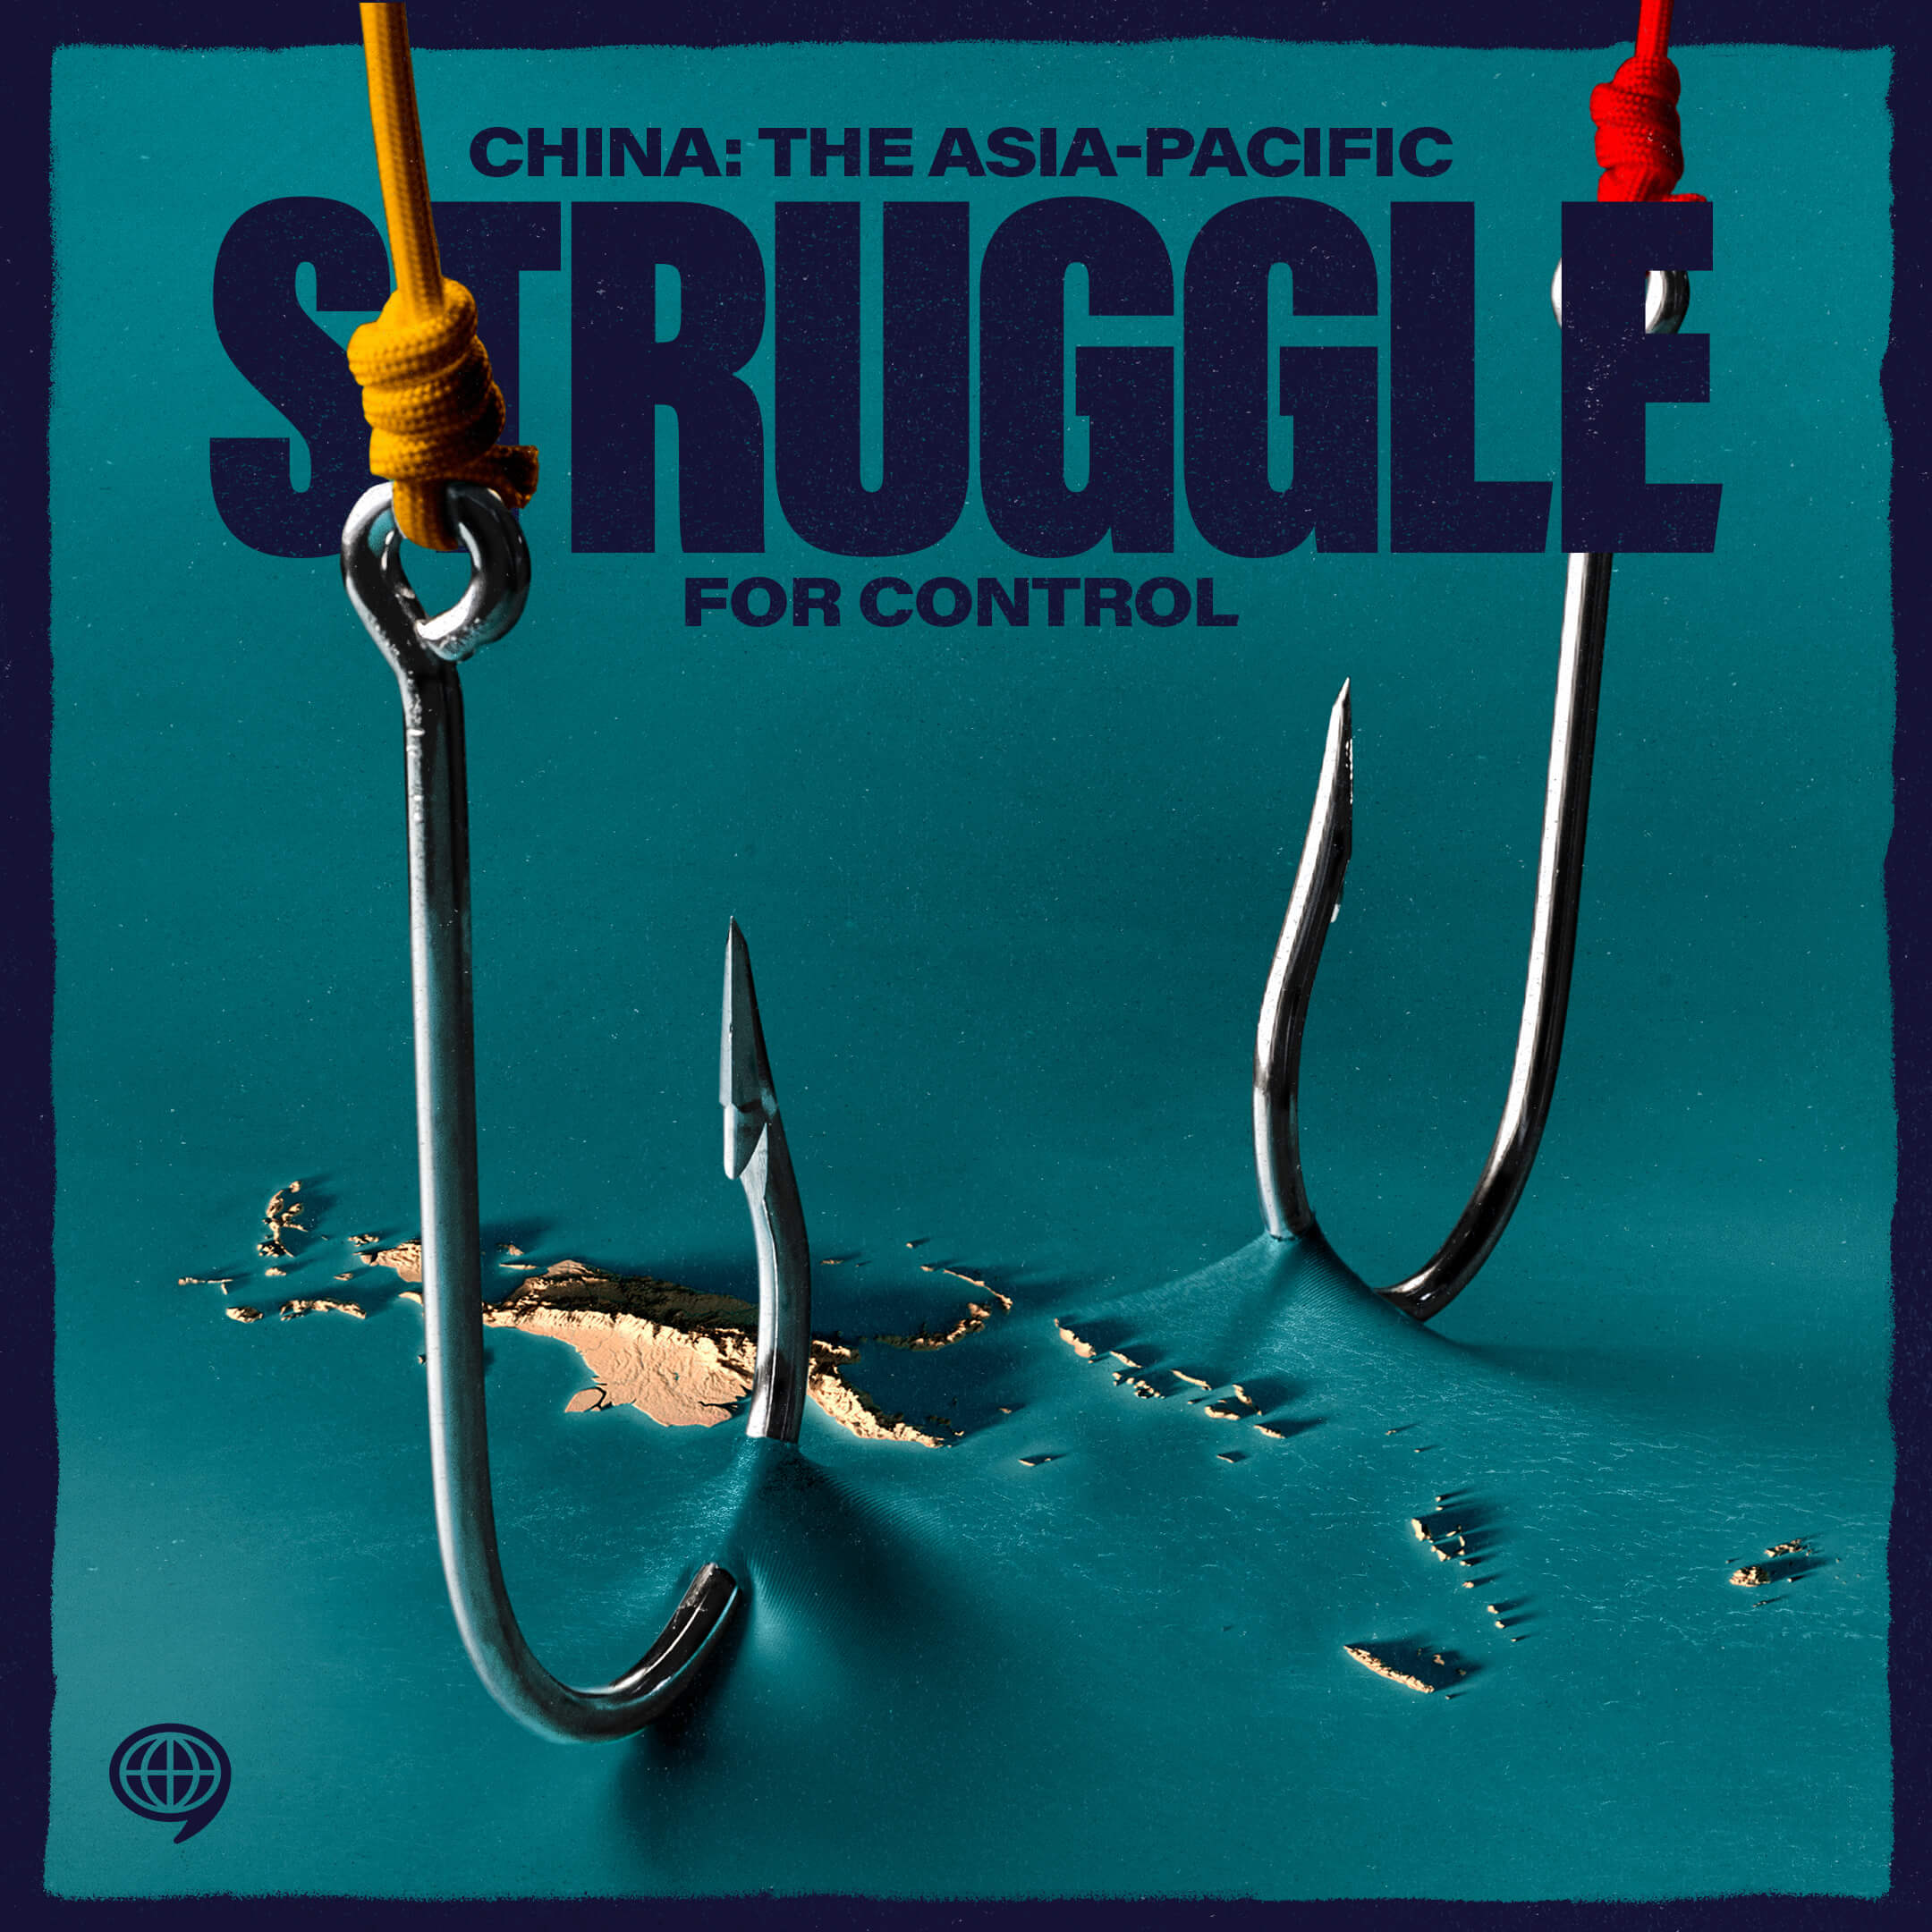 Struggle social image